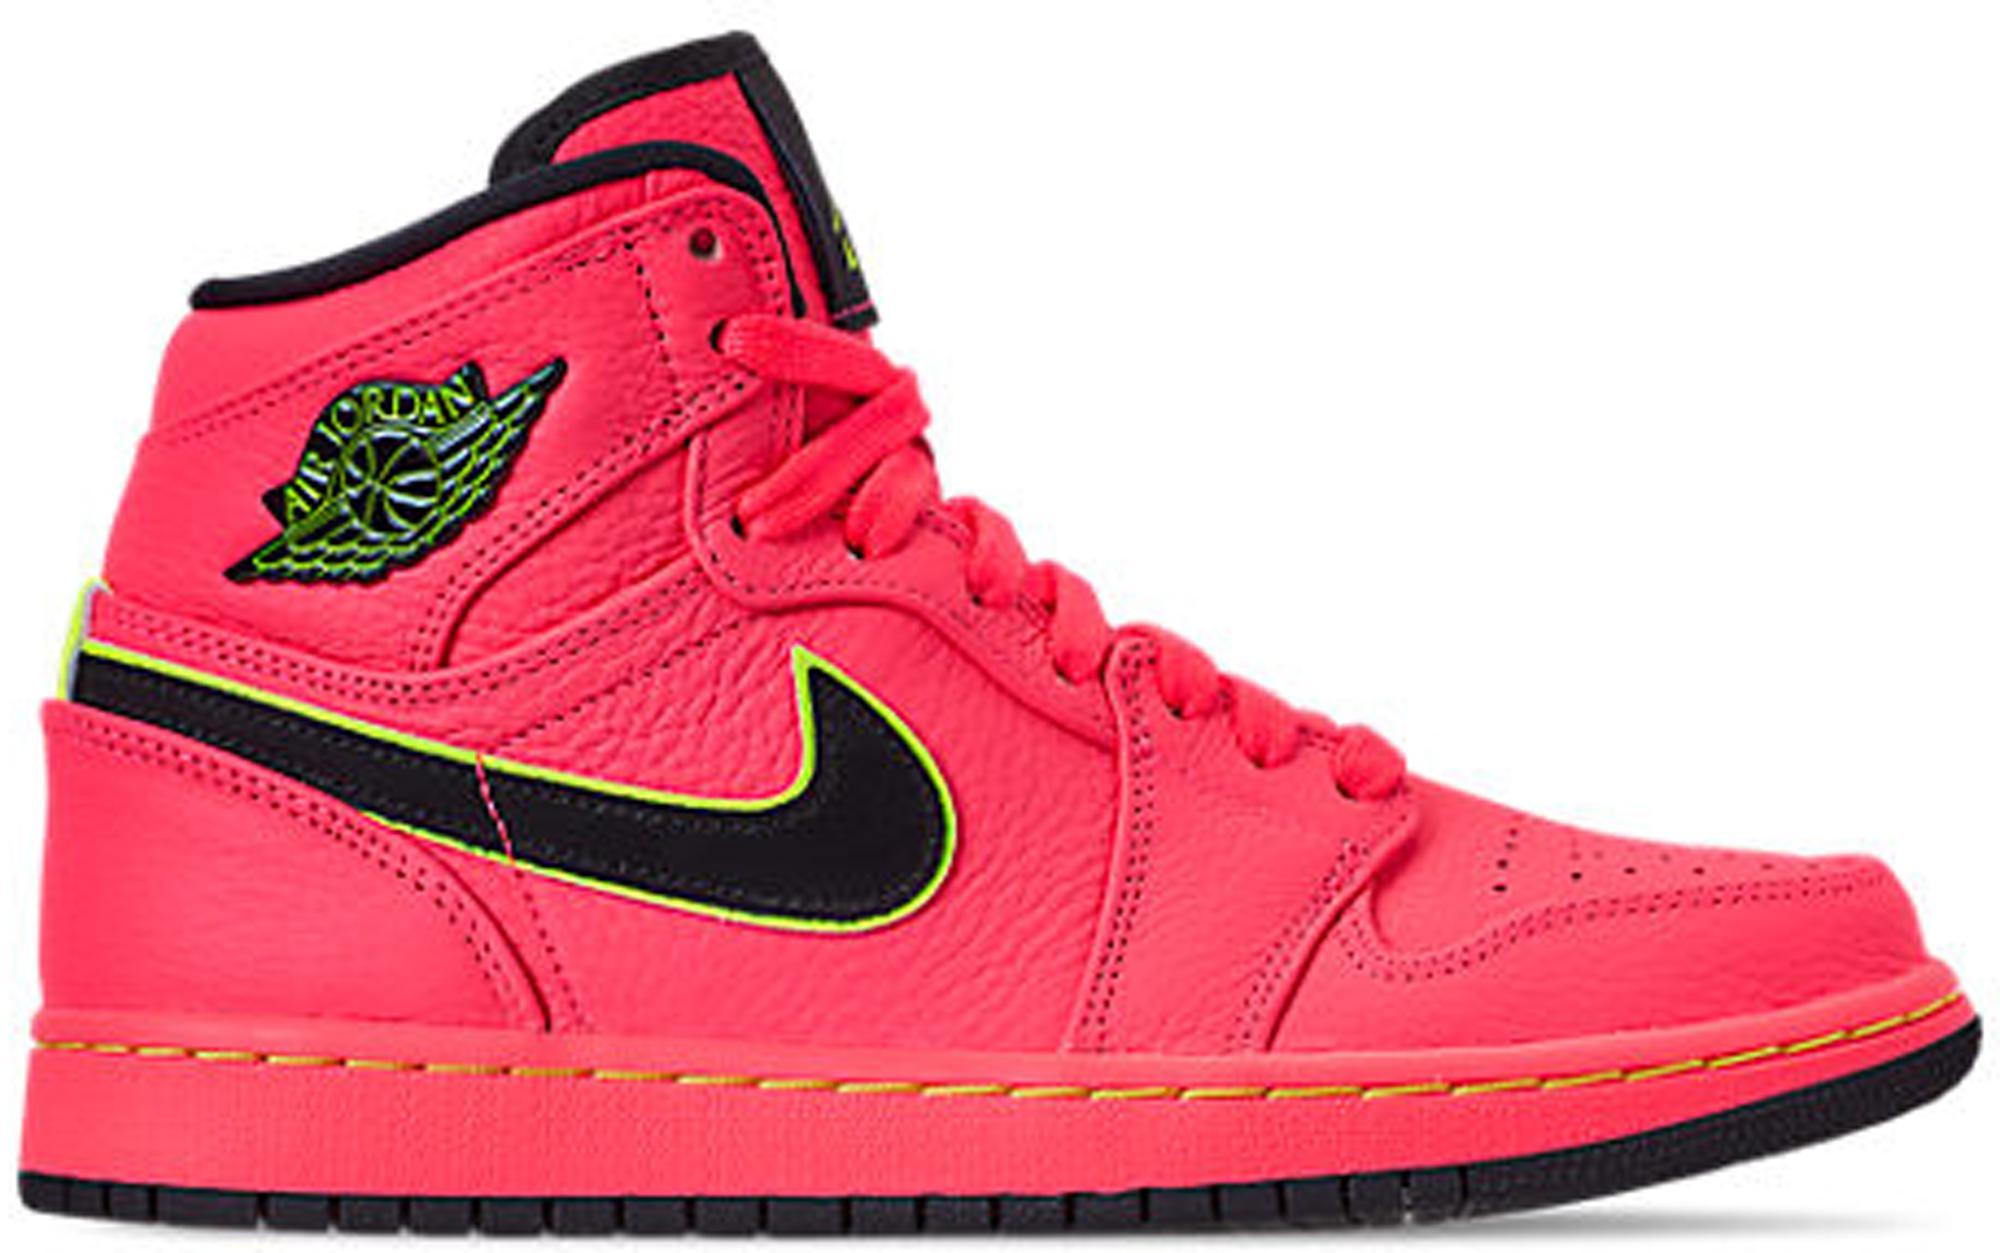 d760b94f Lyst - Nike 1 Retro High Hot Punch (w) in Pink